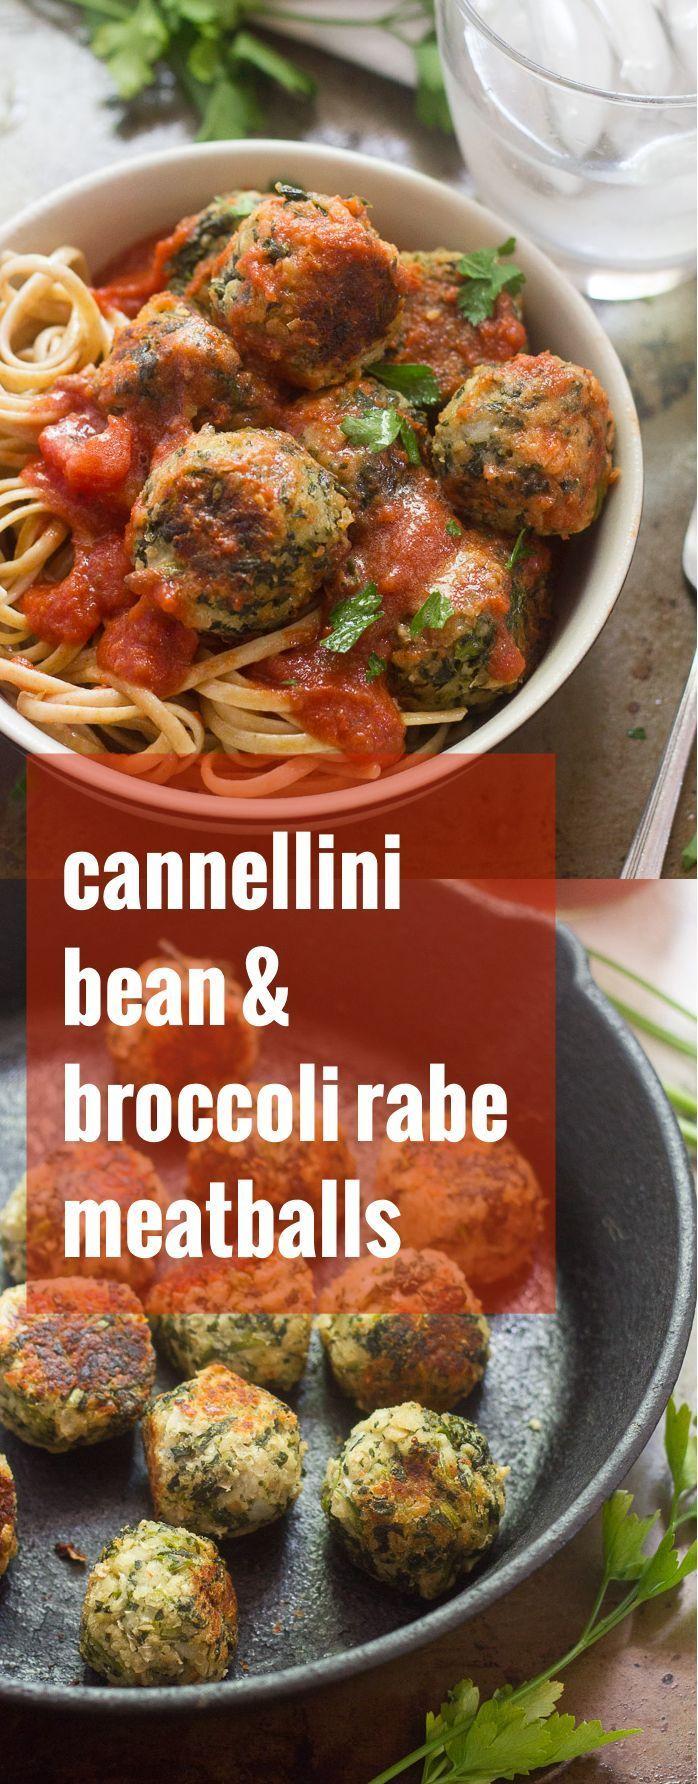 71149 best images about :::: Vegan-n-Vegetarian :::: on ...